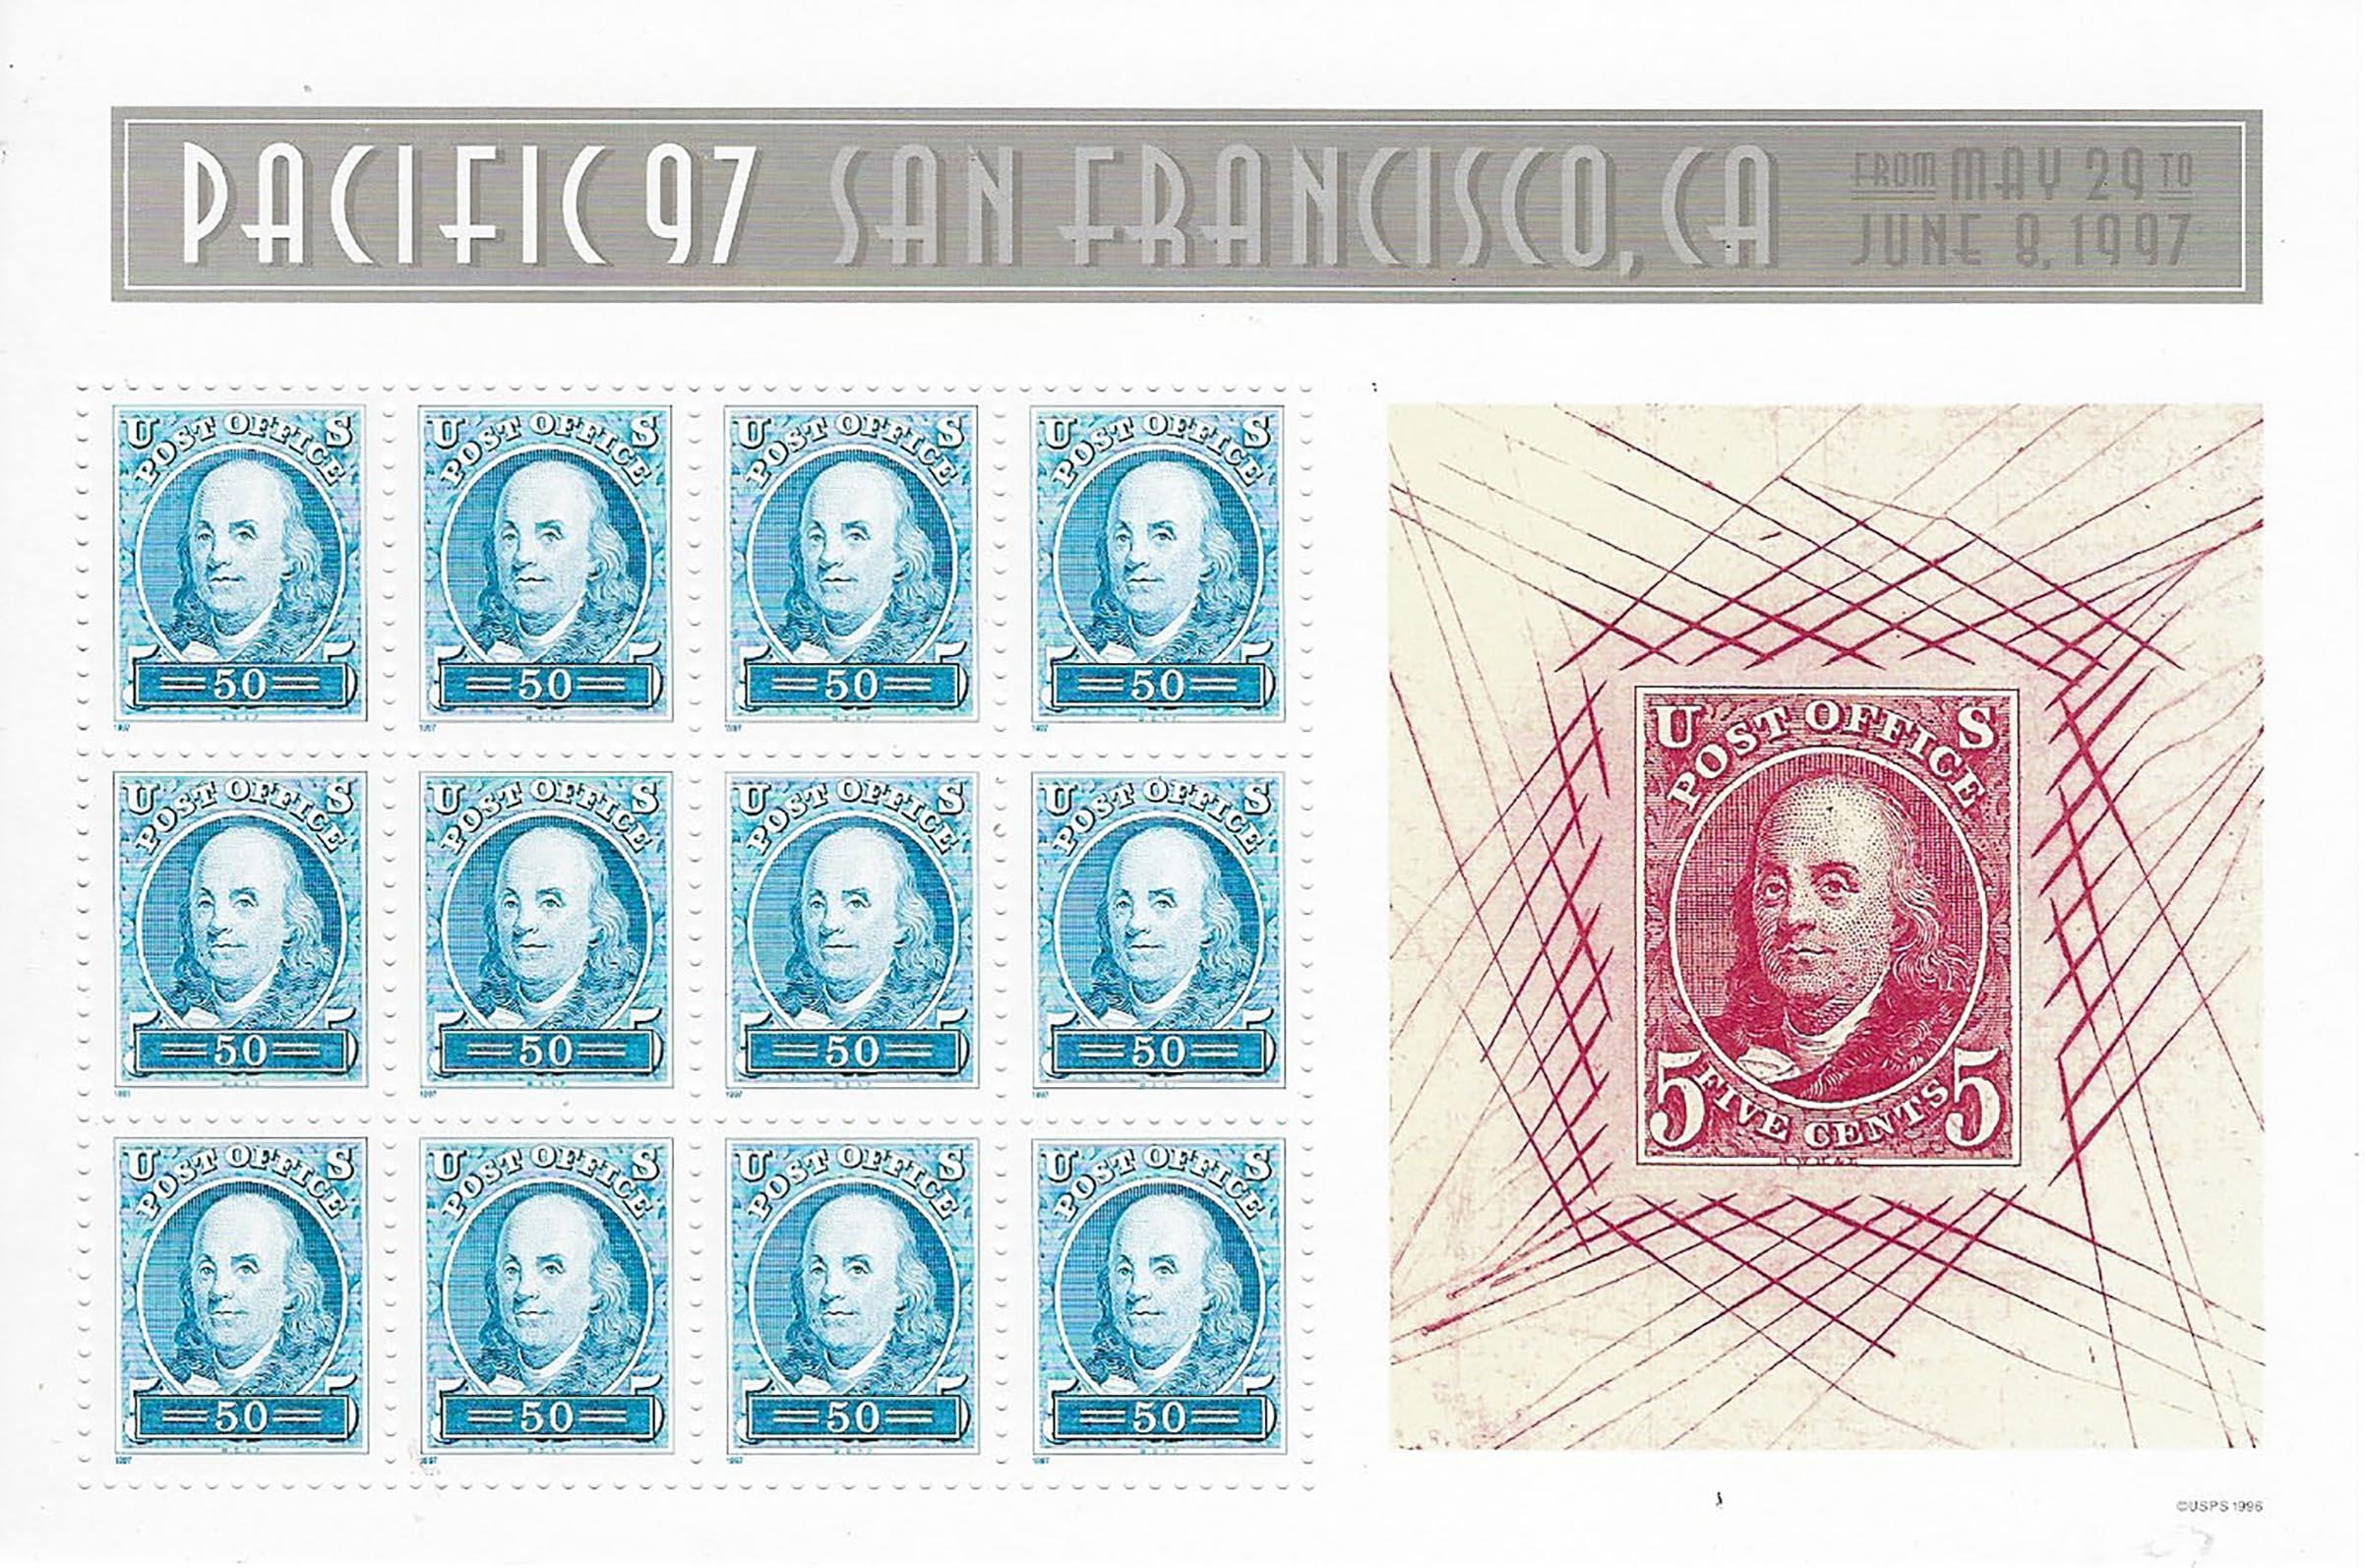 Pacific '97 San Francisco Stamp Set. May 29-June 8, 1997